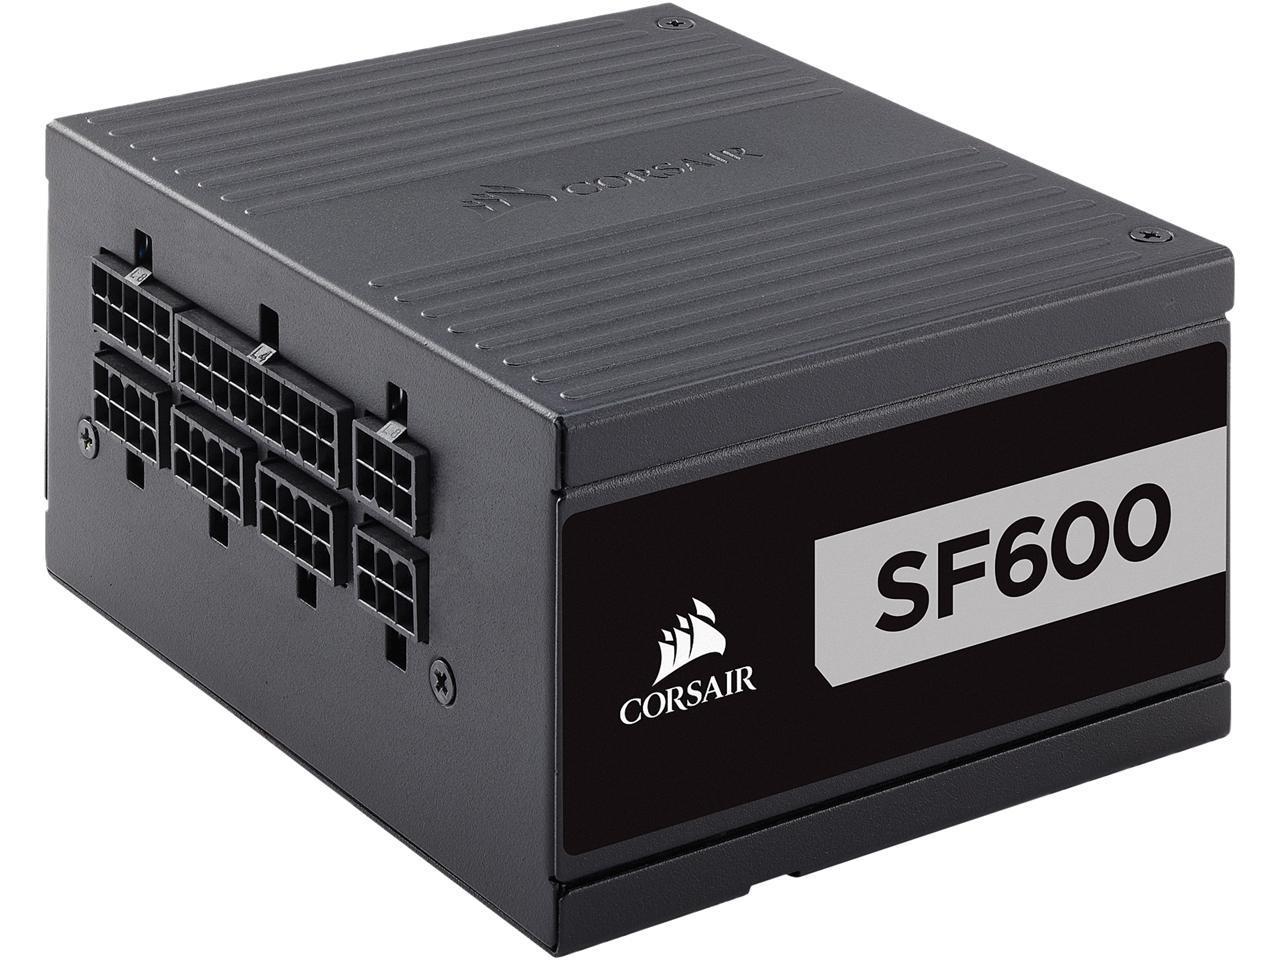 Corsair SF600 600W SFX 80 Plus Platinum Modular PSU $99 AR